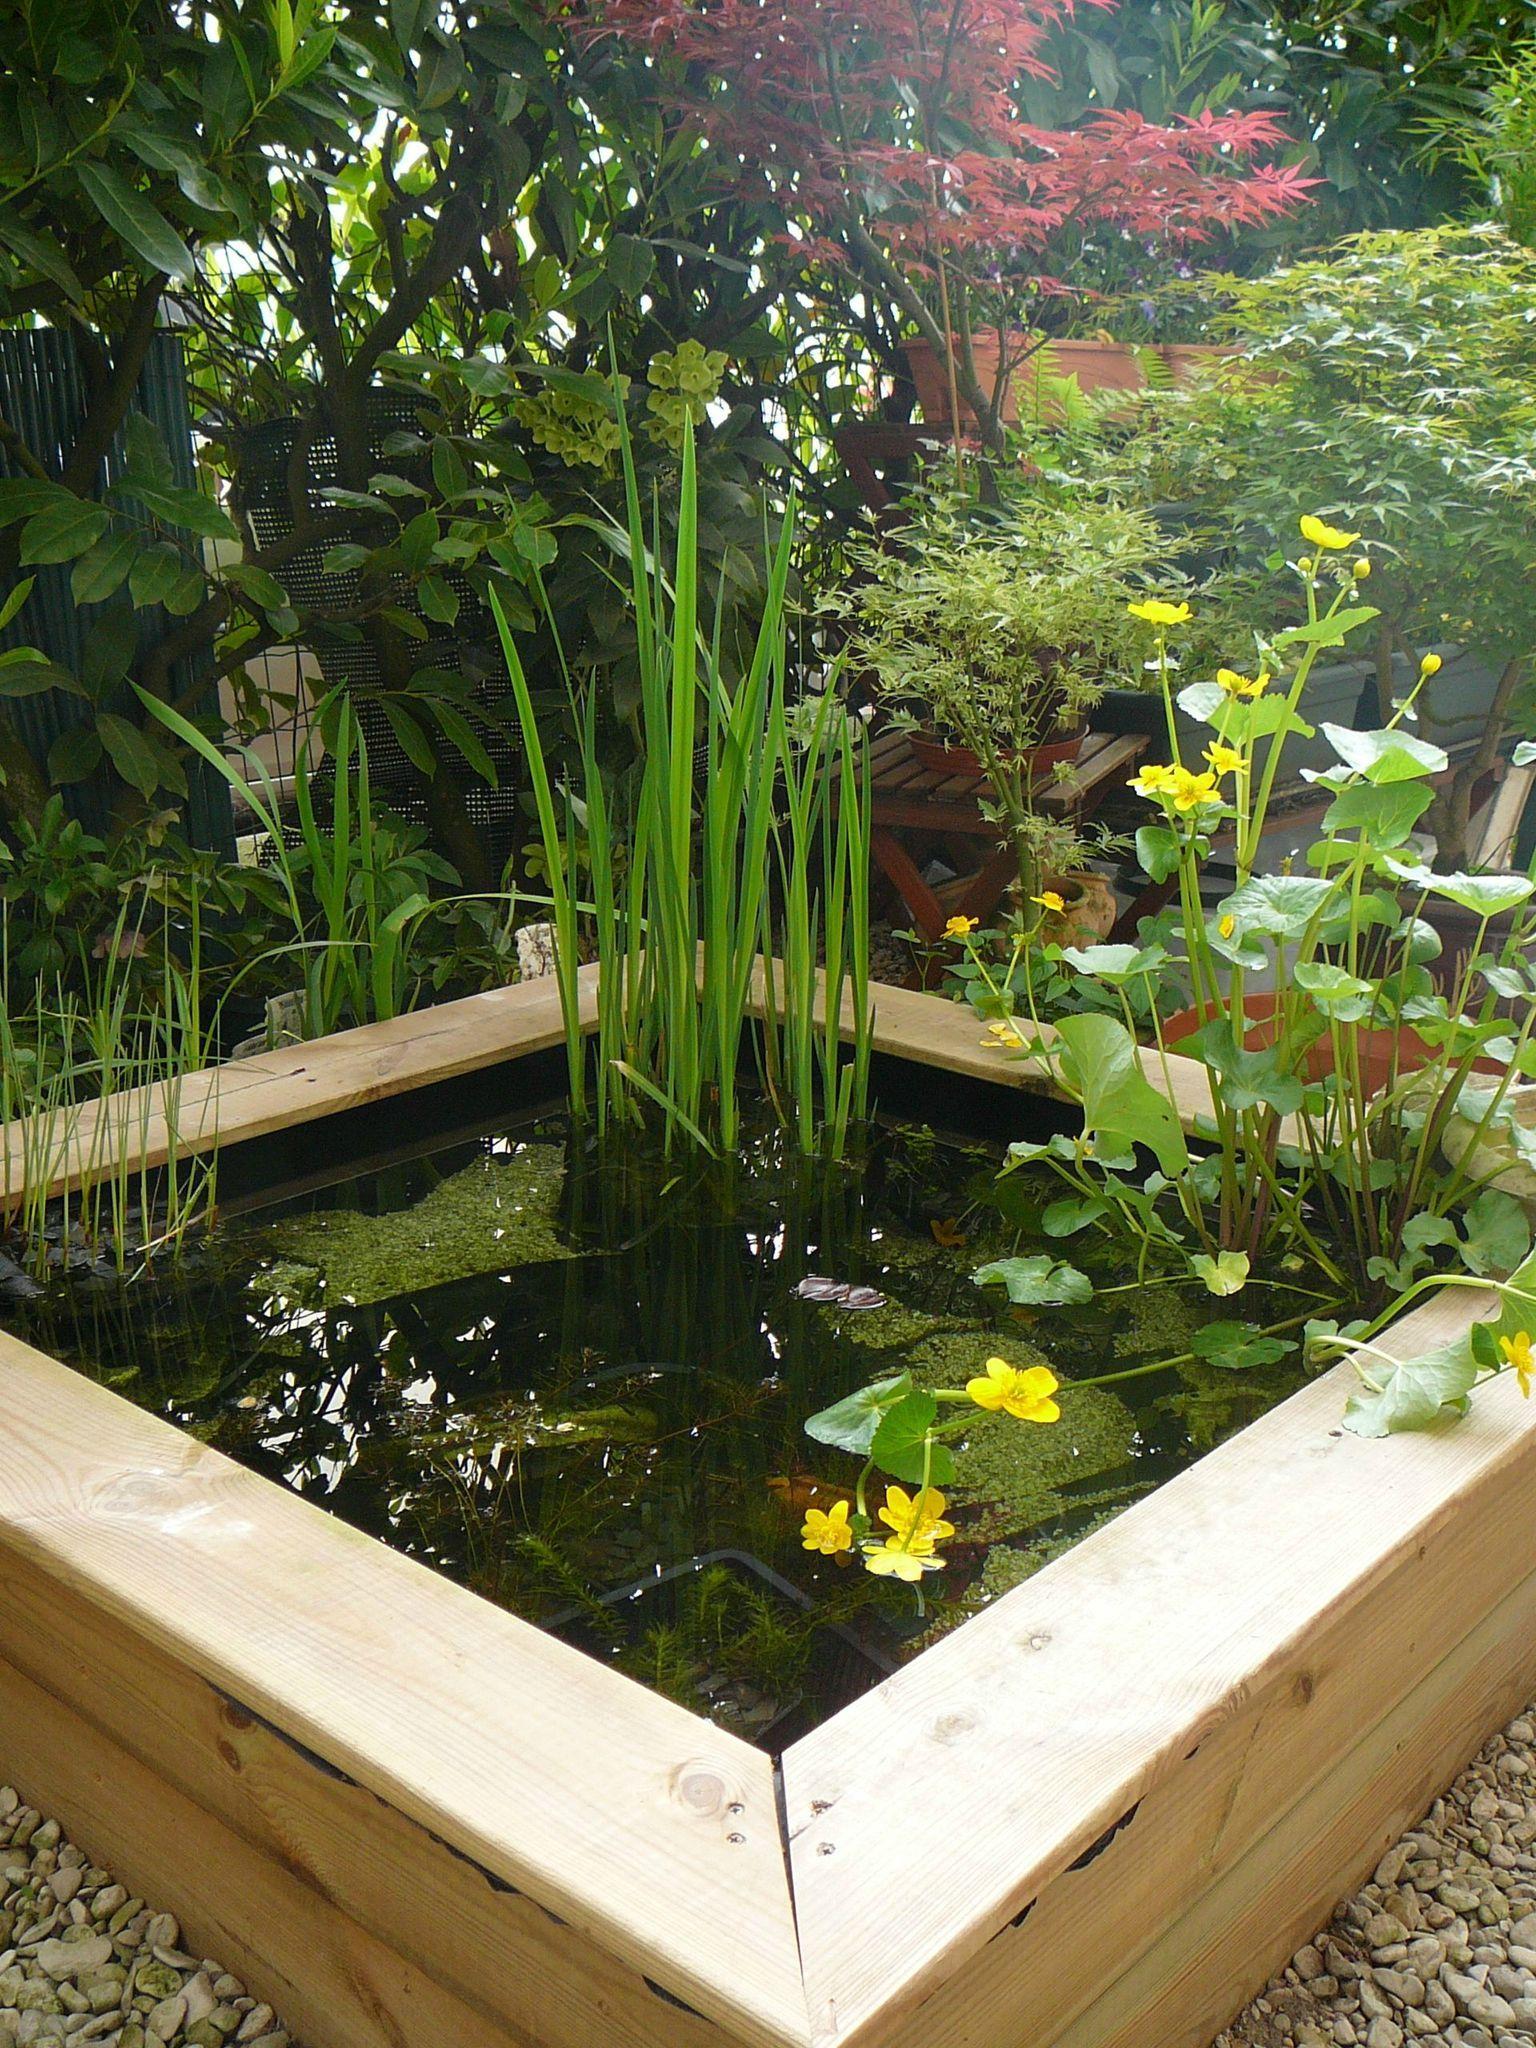 100 Incroyable Idées Petit Bassin Poisson Terrasse